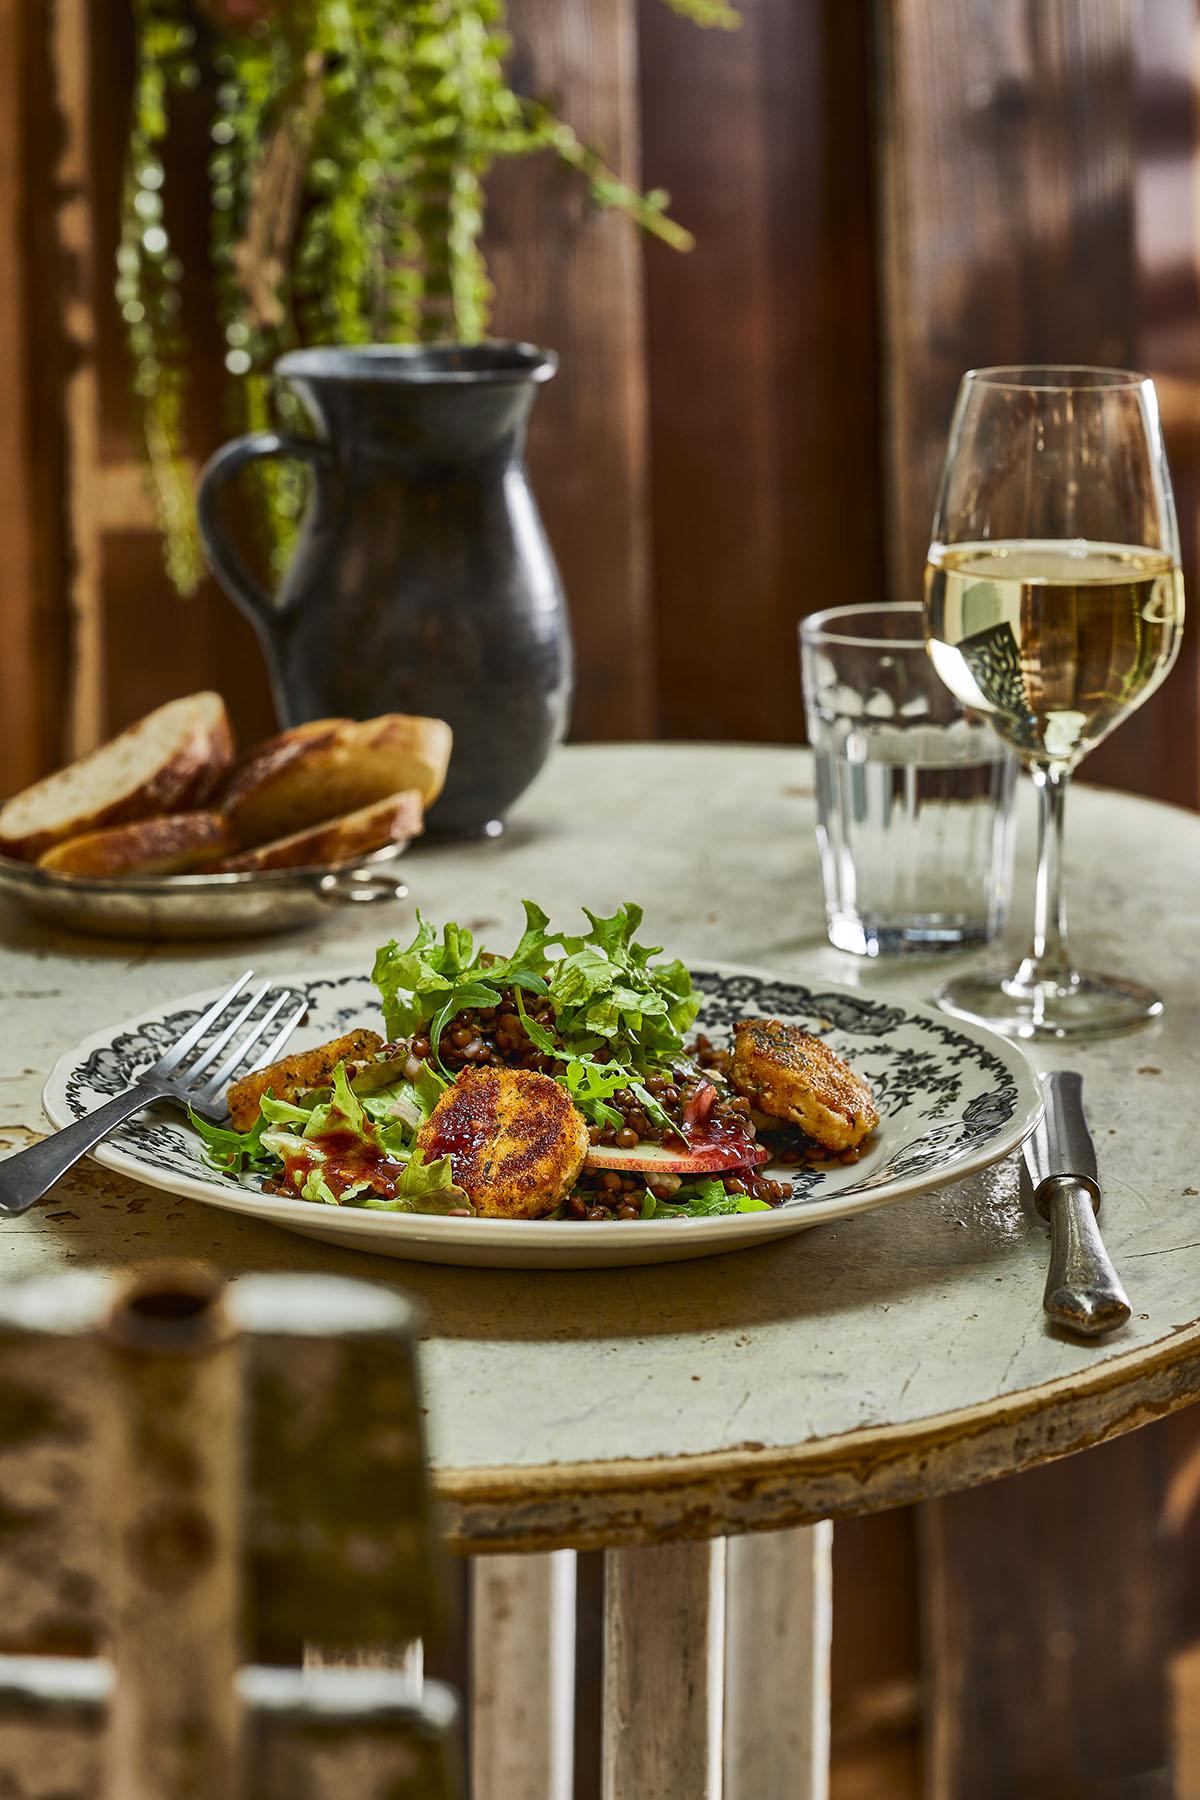 Linzensalade met geitenkaas en frambozen-vinaigrette